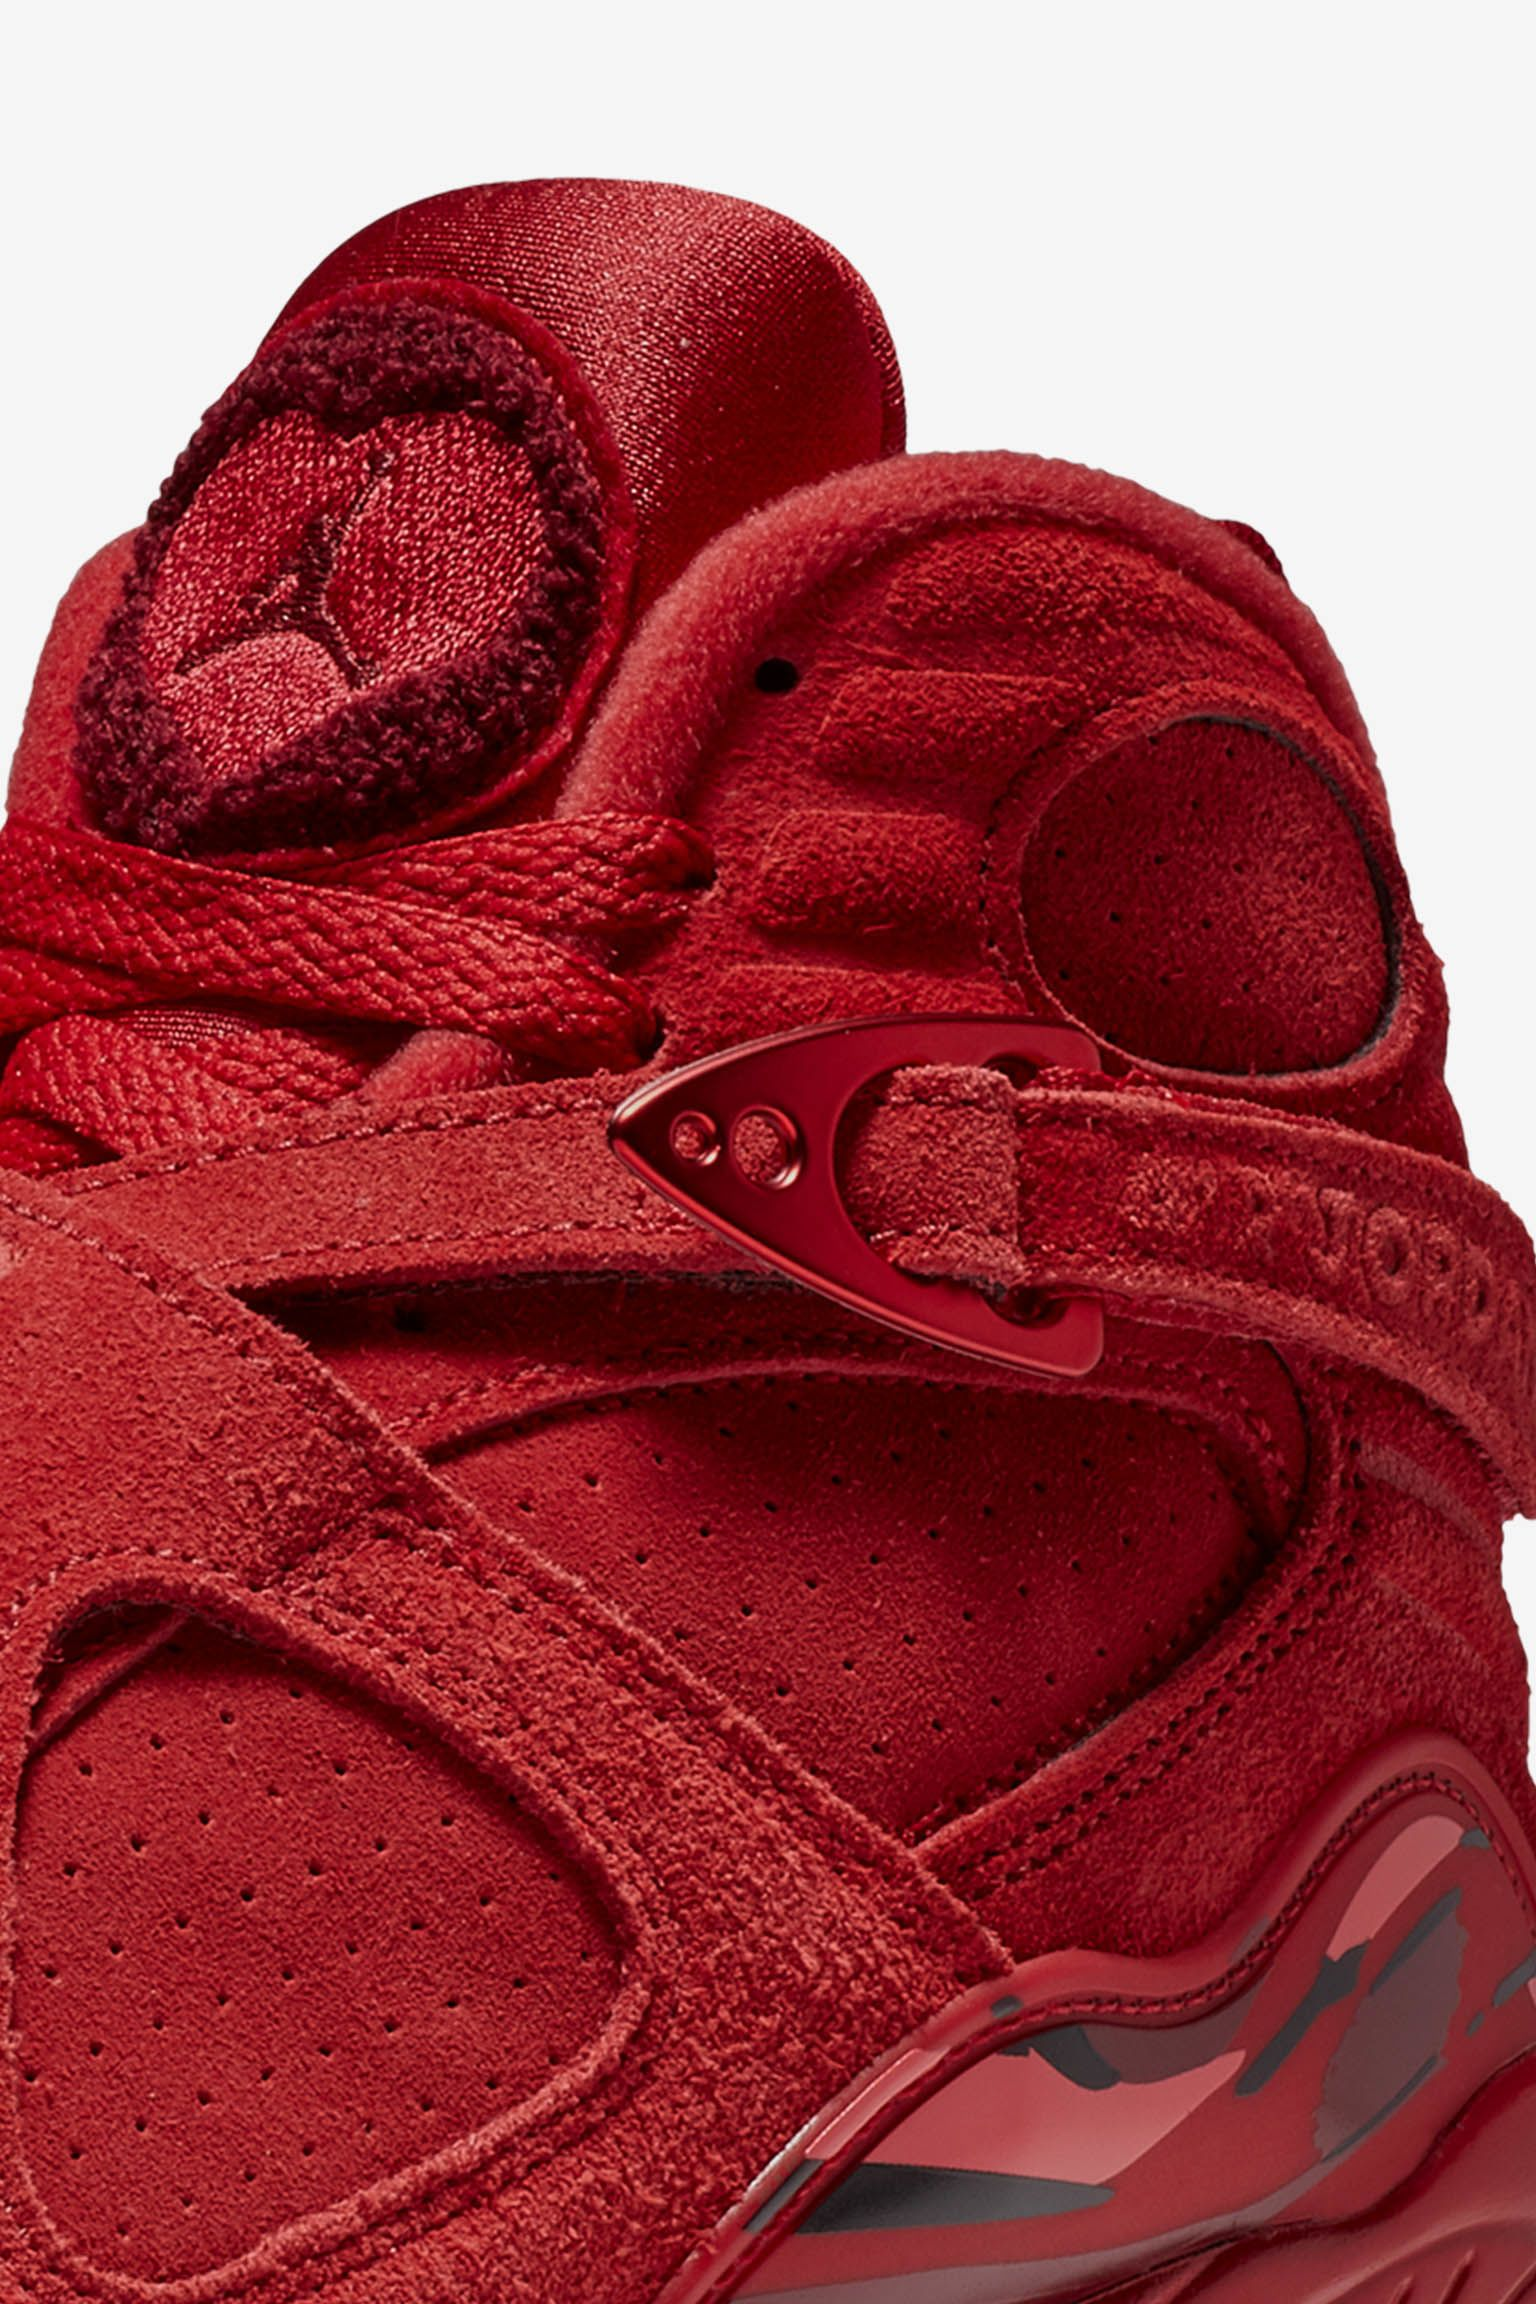 Air Jordan 8 Retro Valentine's Day